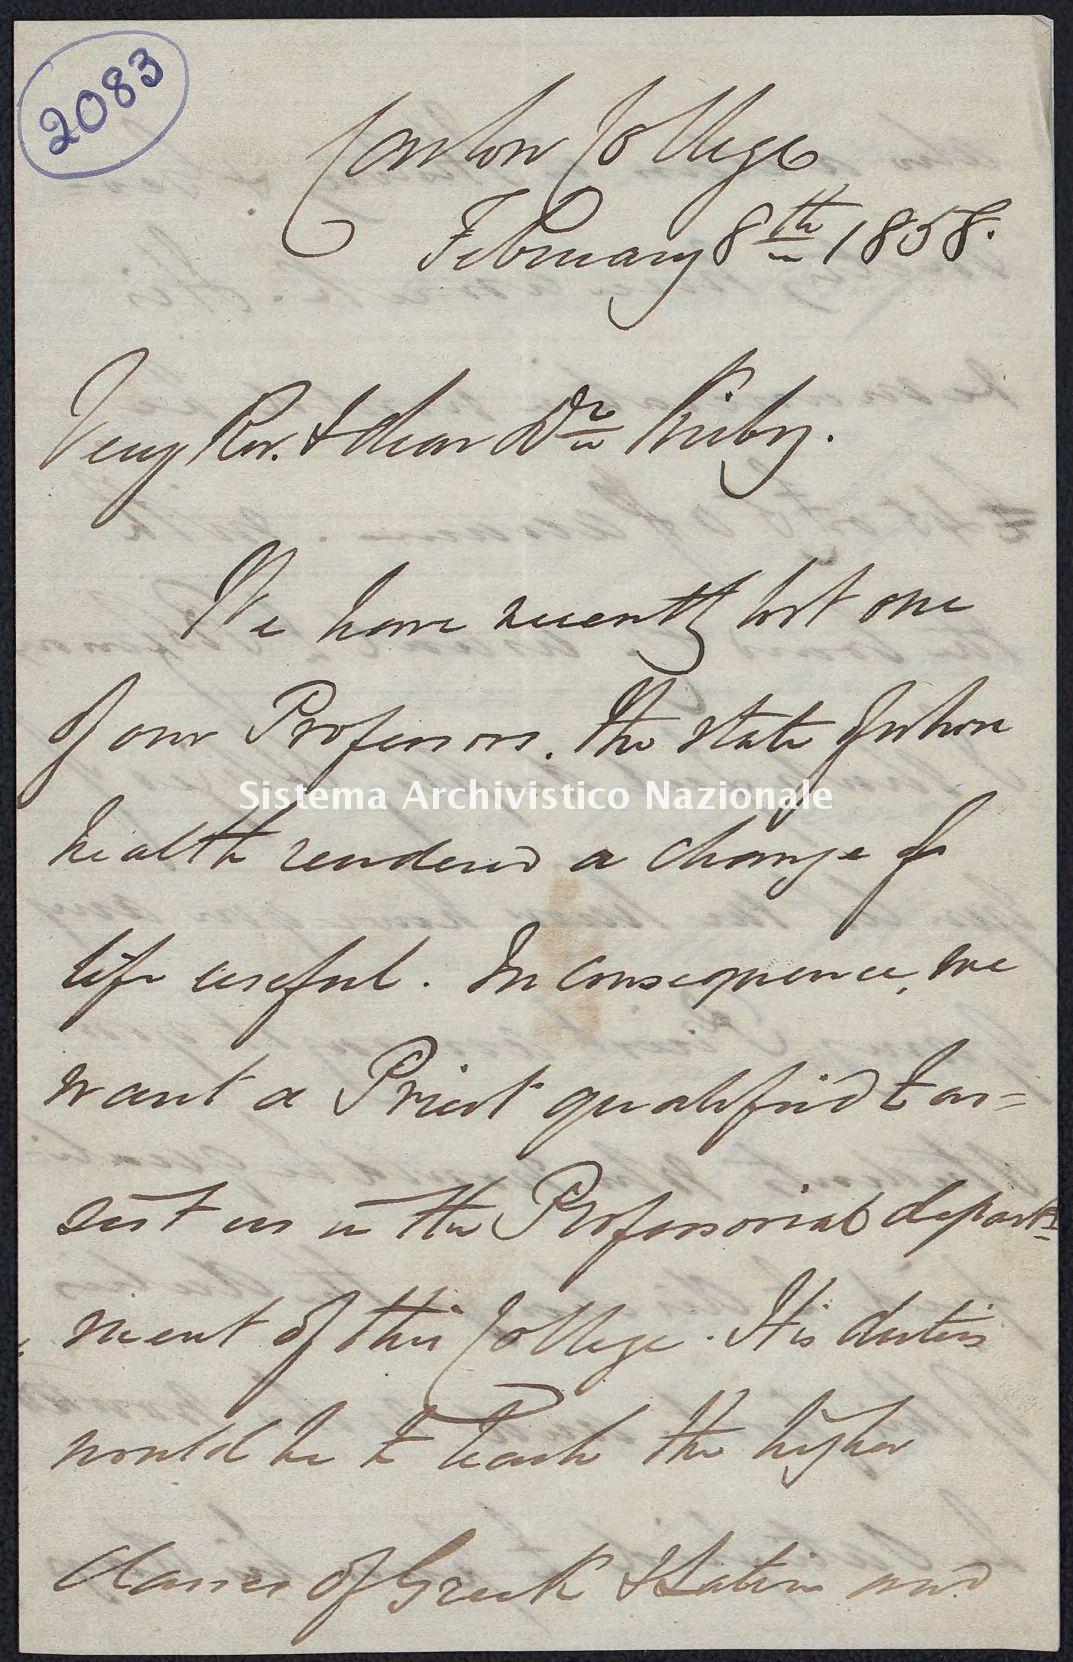 Pontificio Collegio Irlandese - Kirby_1858_2083